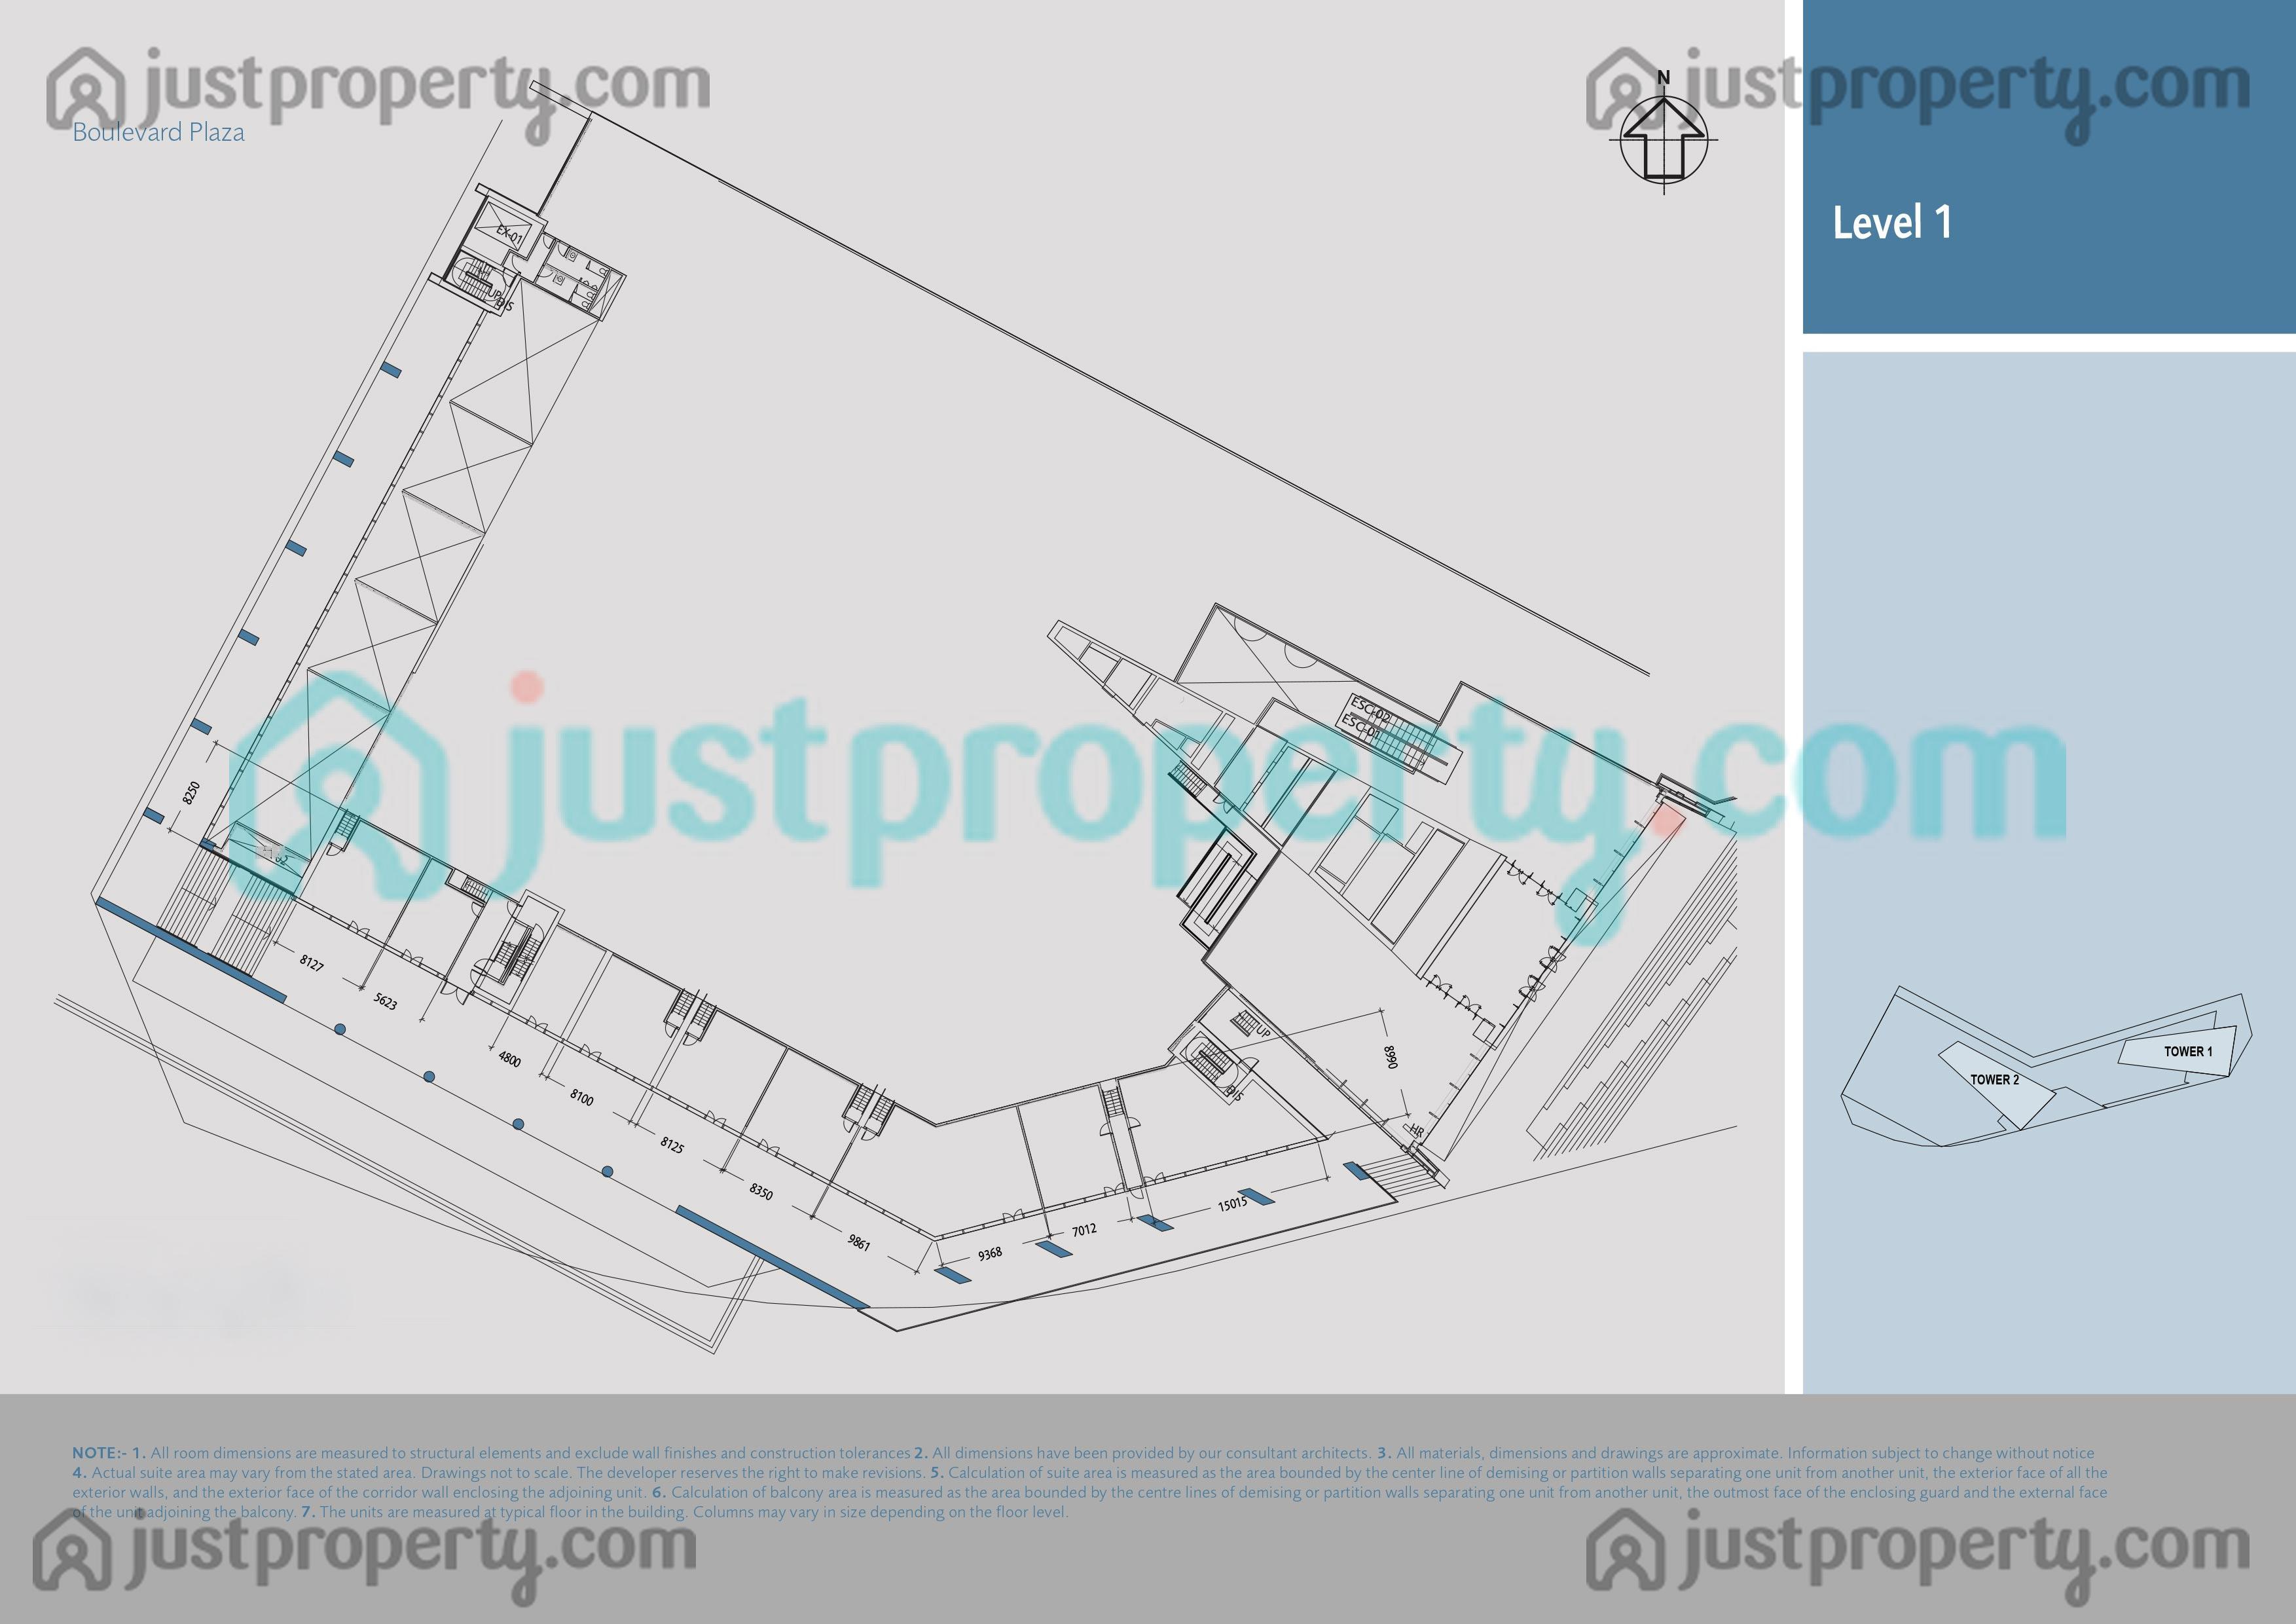 Boulevard Plaza Tower 2 Floor Plans Justproperty Com